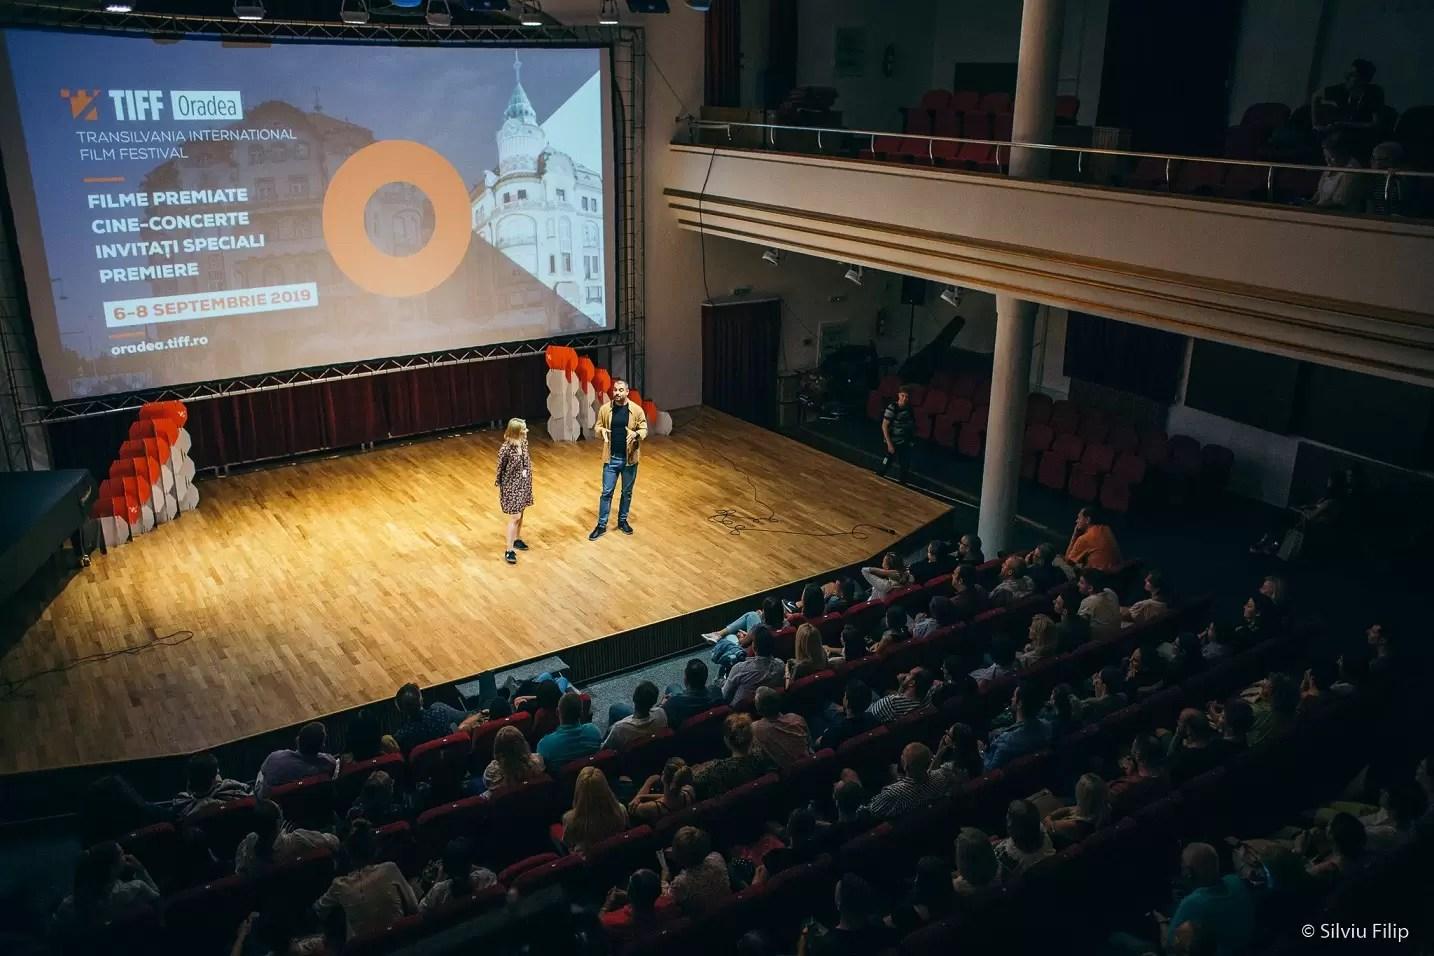 Proiectia La Gomera - TIFF Oradea 2019 afiș